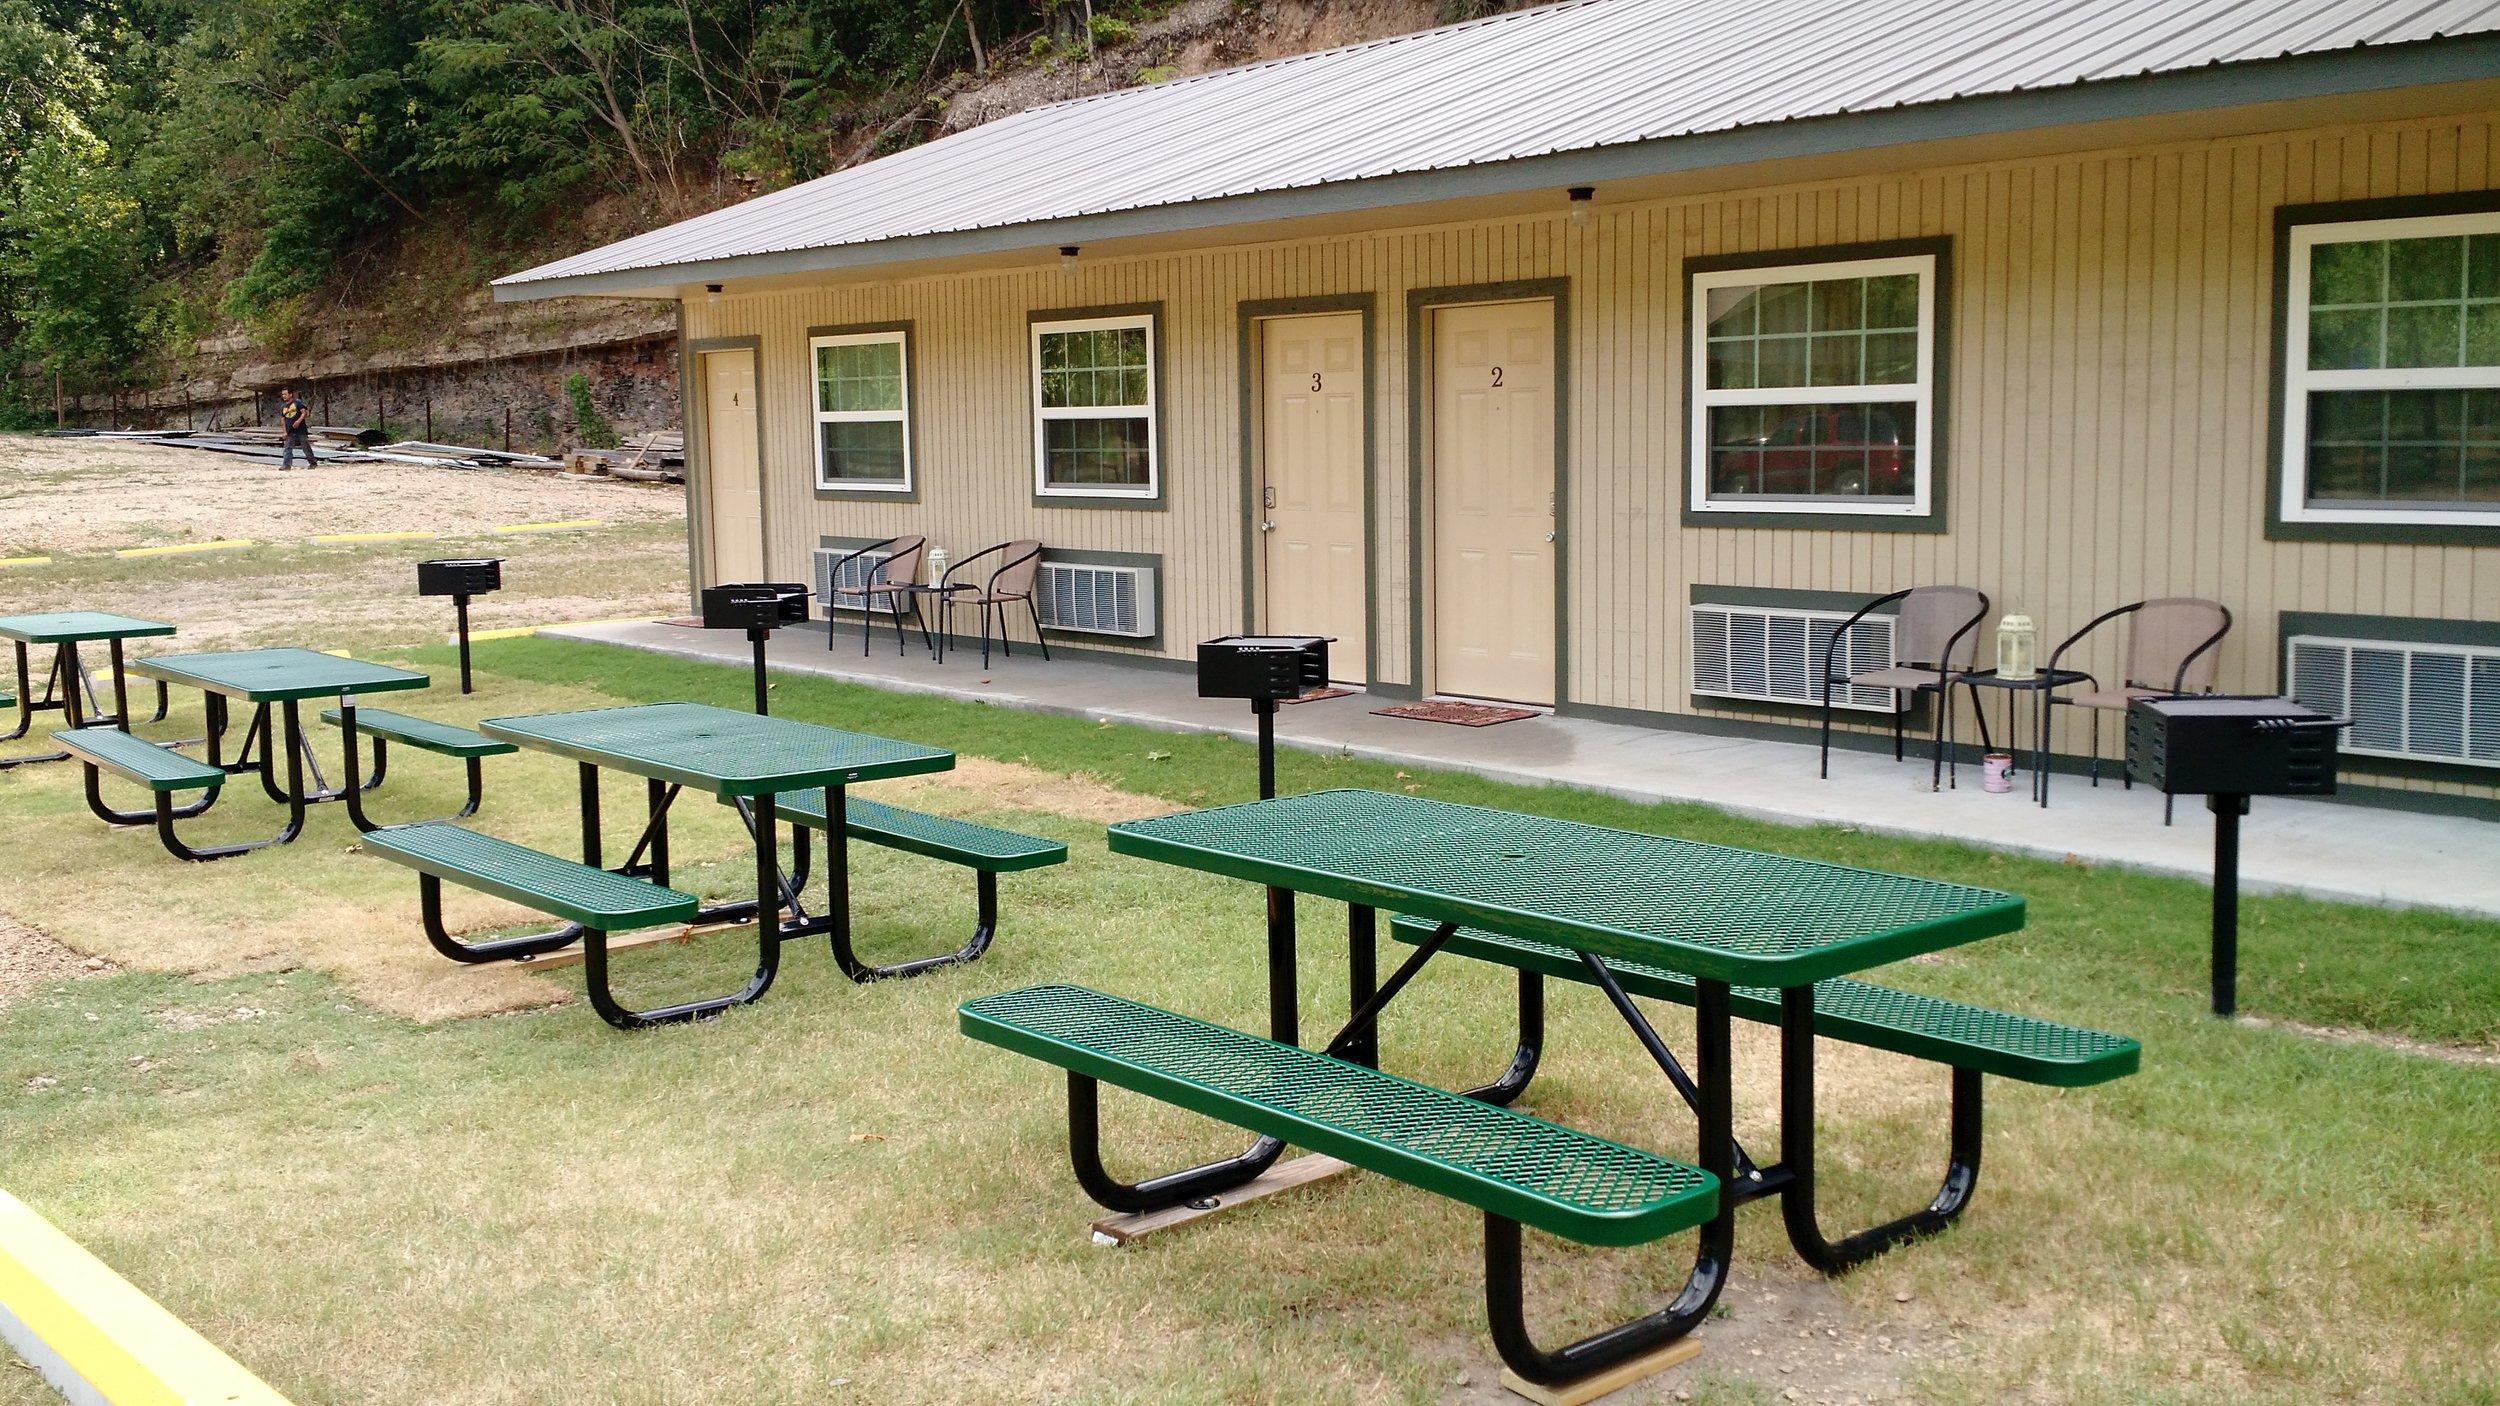 Picnic tables & grills at Riverbend Inn